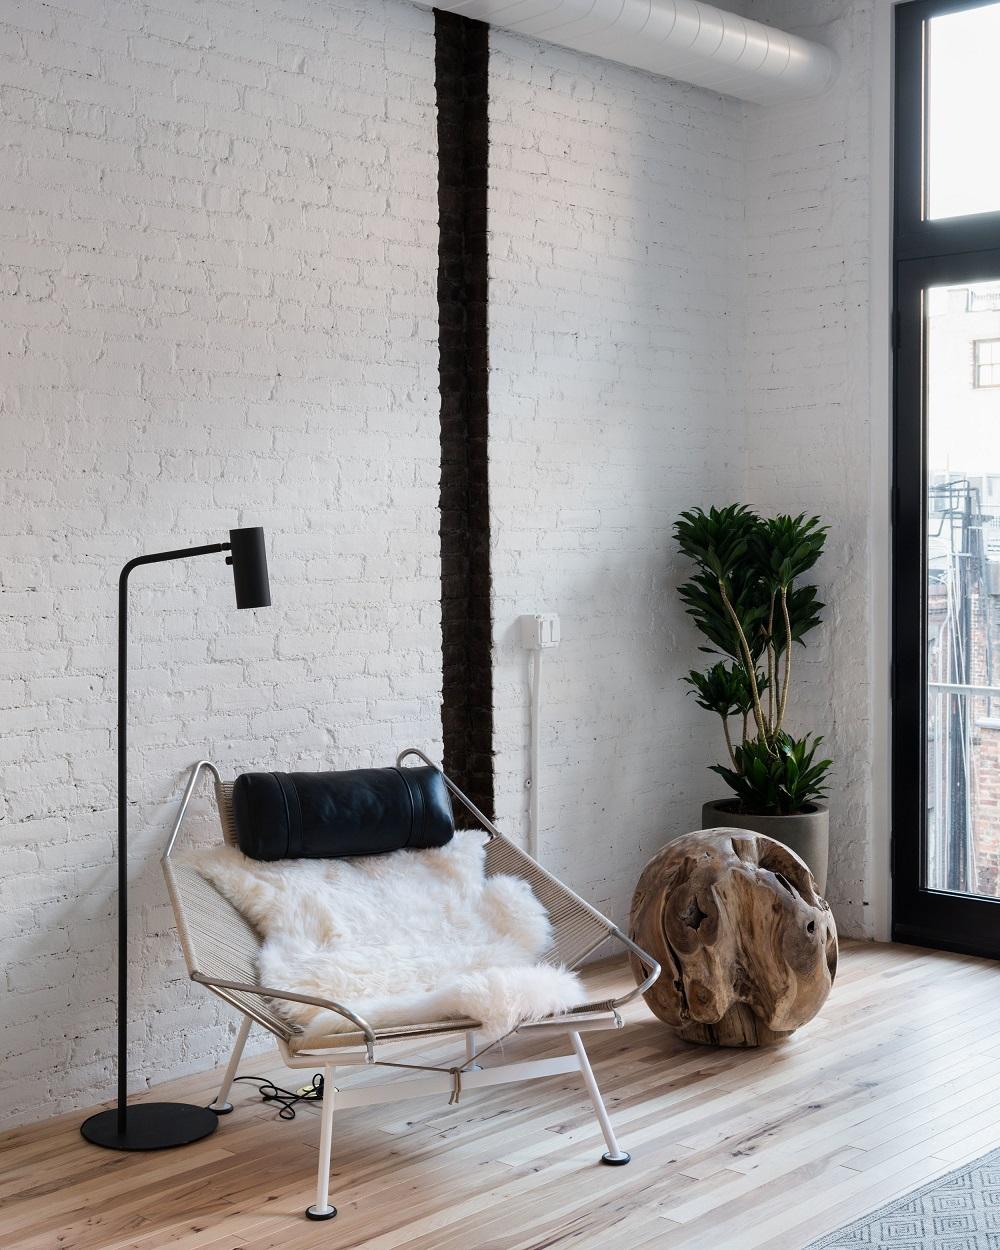 thenordroom-loft11.jpg